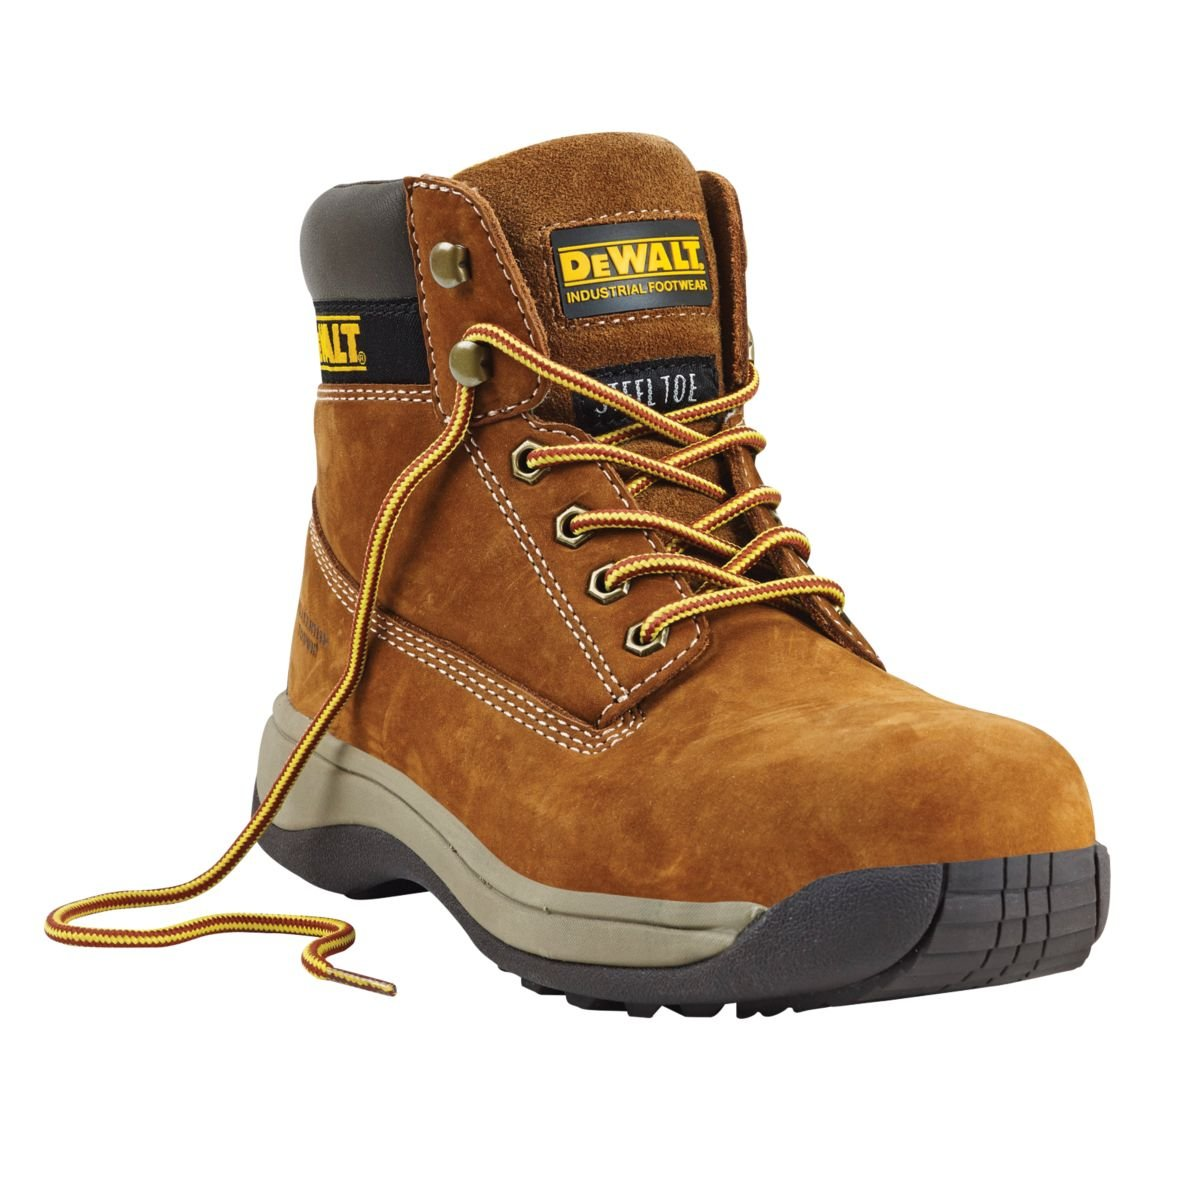 24514bfc0c4 DeWalt Apprentice Safety Boots Sundance Size 10: Amazon.co.uk: DIY ...